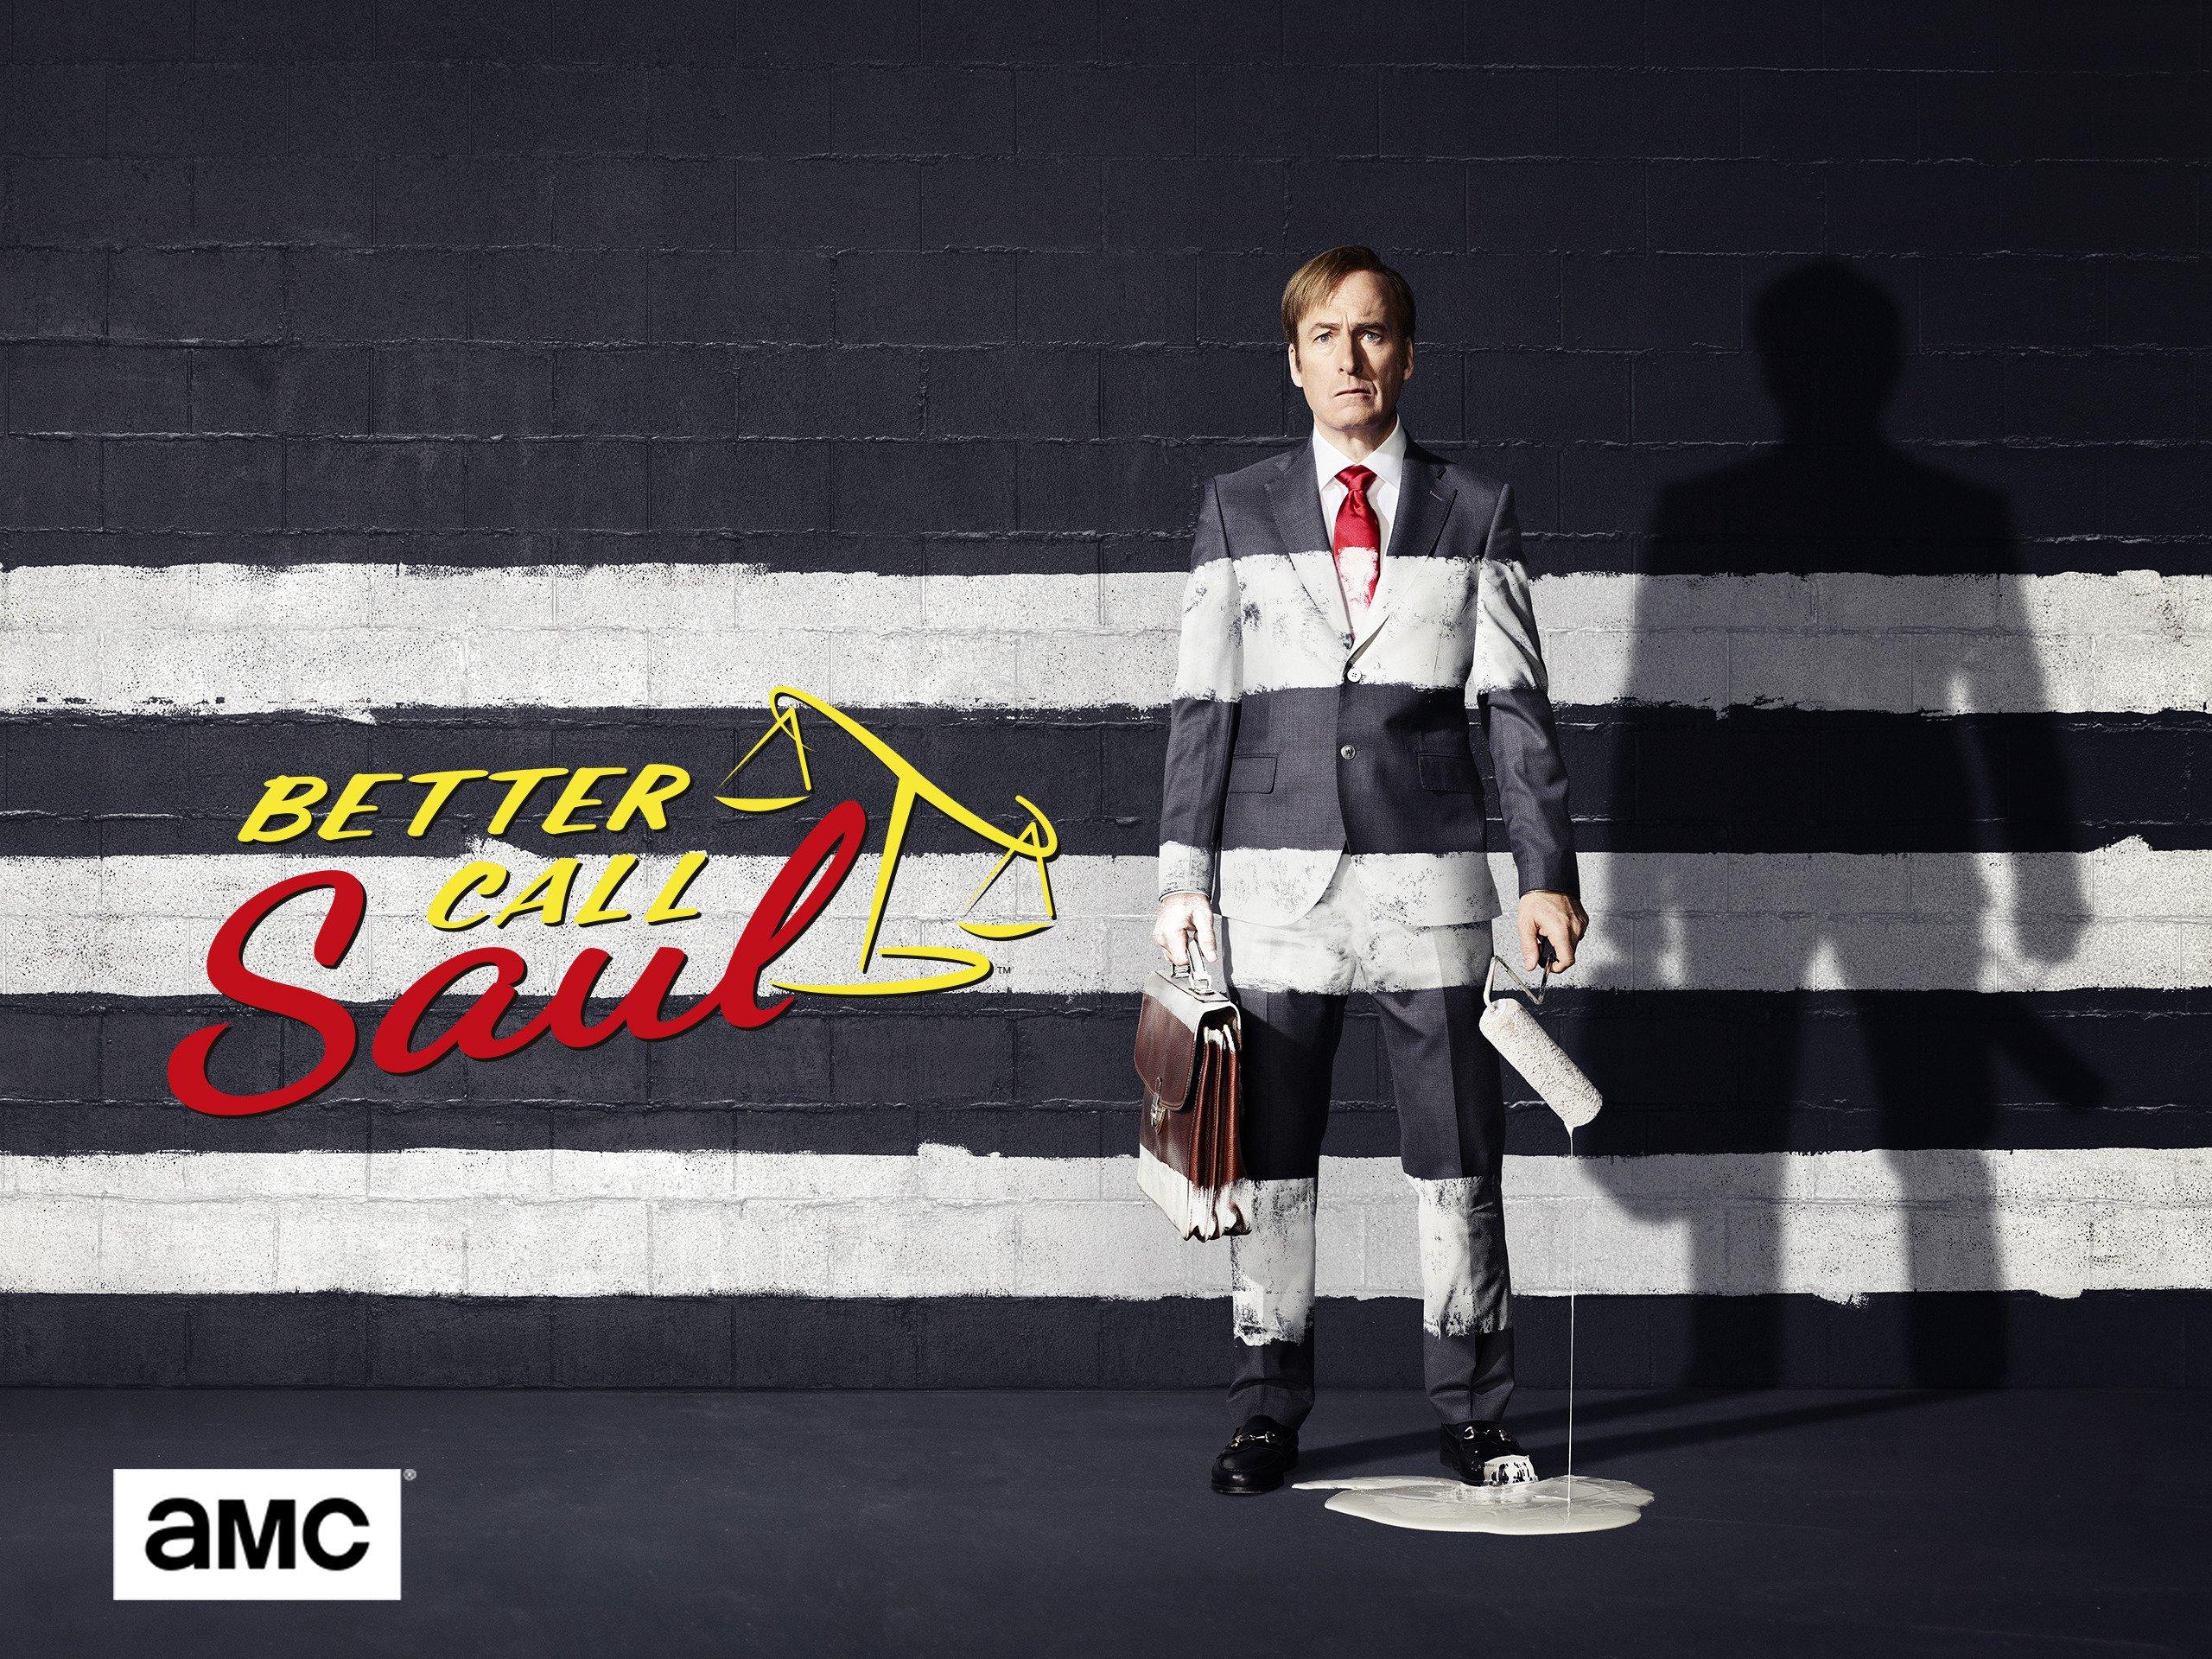 better call saul season 3 online stream free